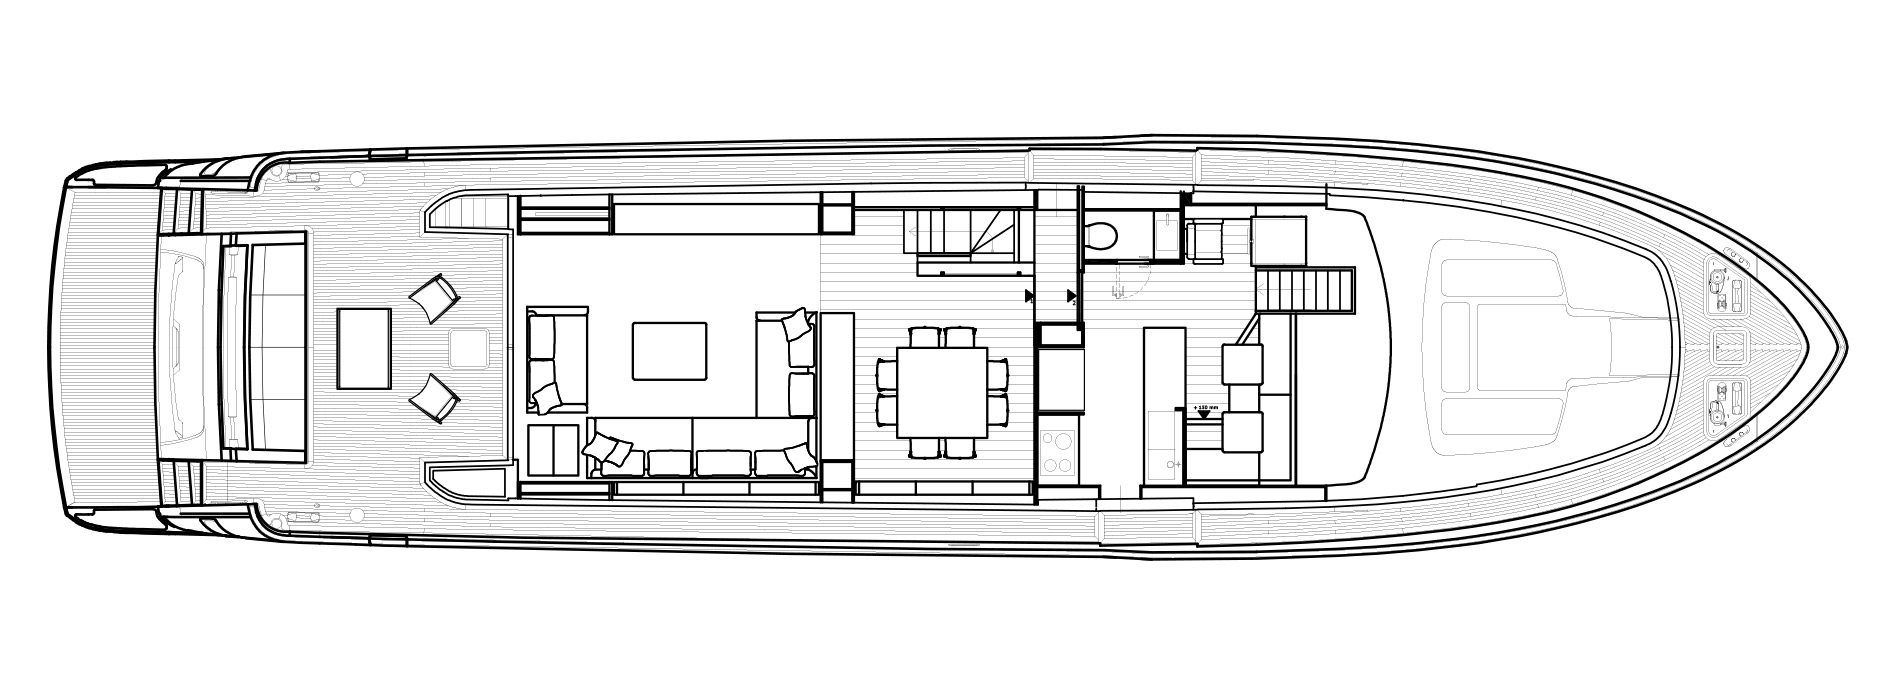 Sanlorenzo Yachts SL86 Pont principal Versione USA